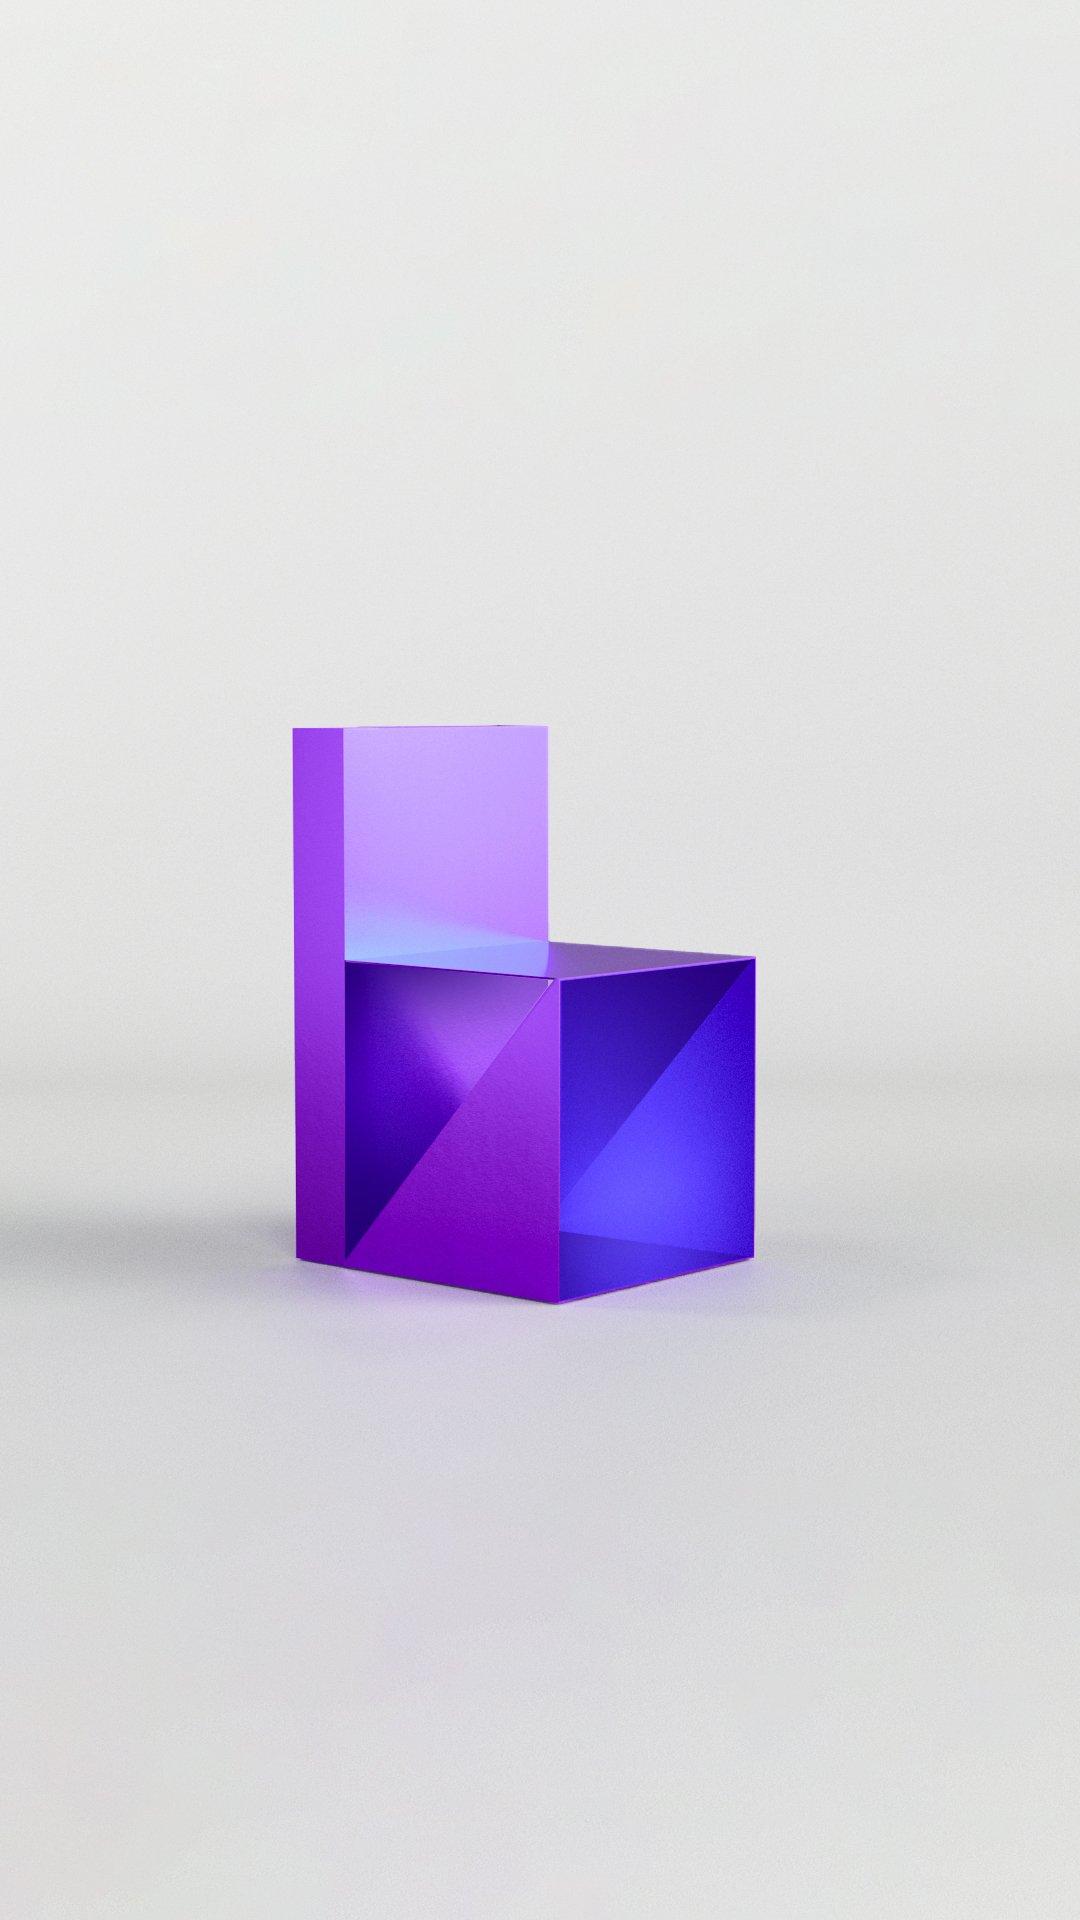 Mobilier et objets design, onlyonly.studio, Z chair